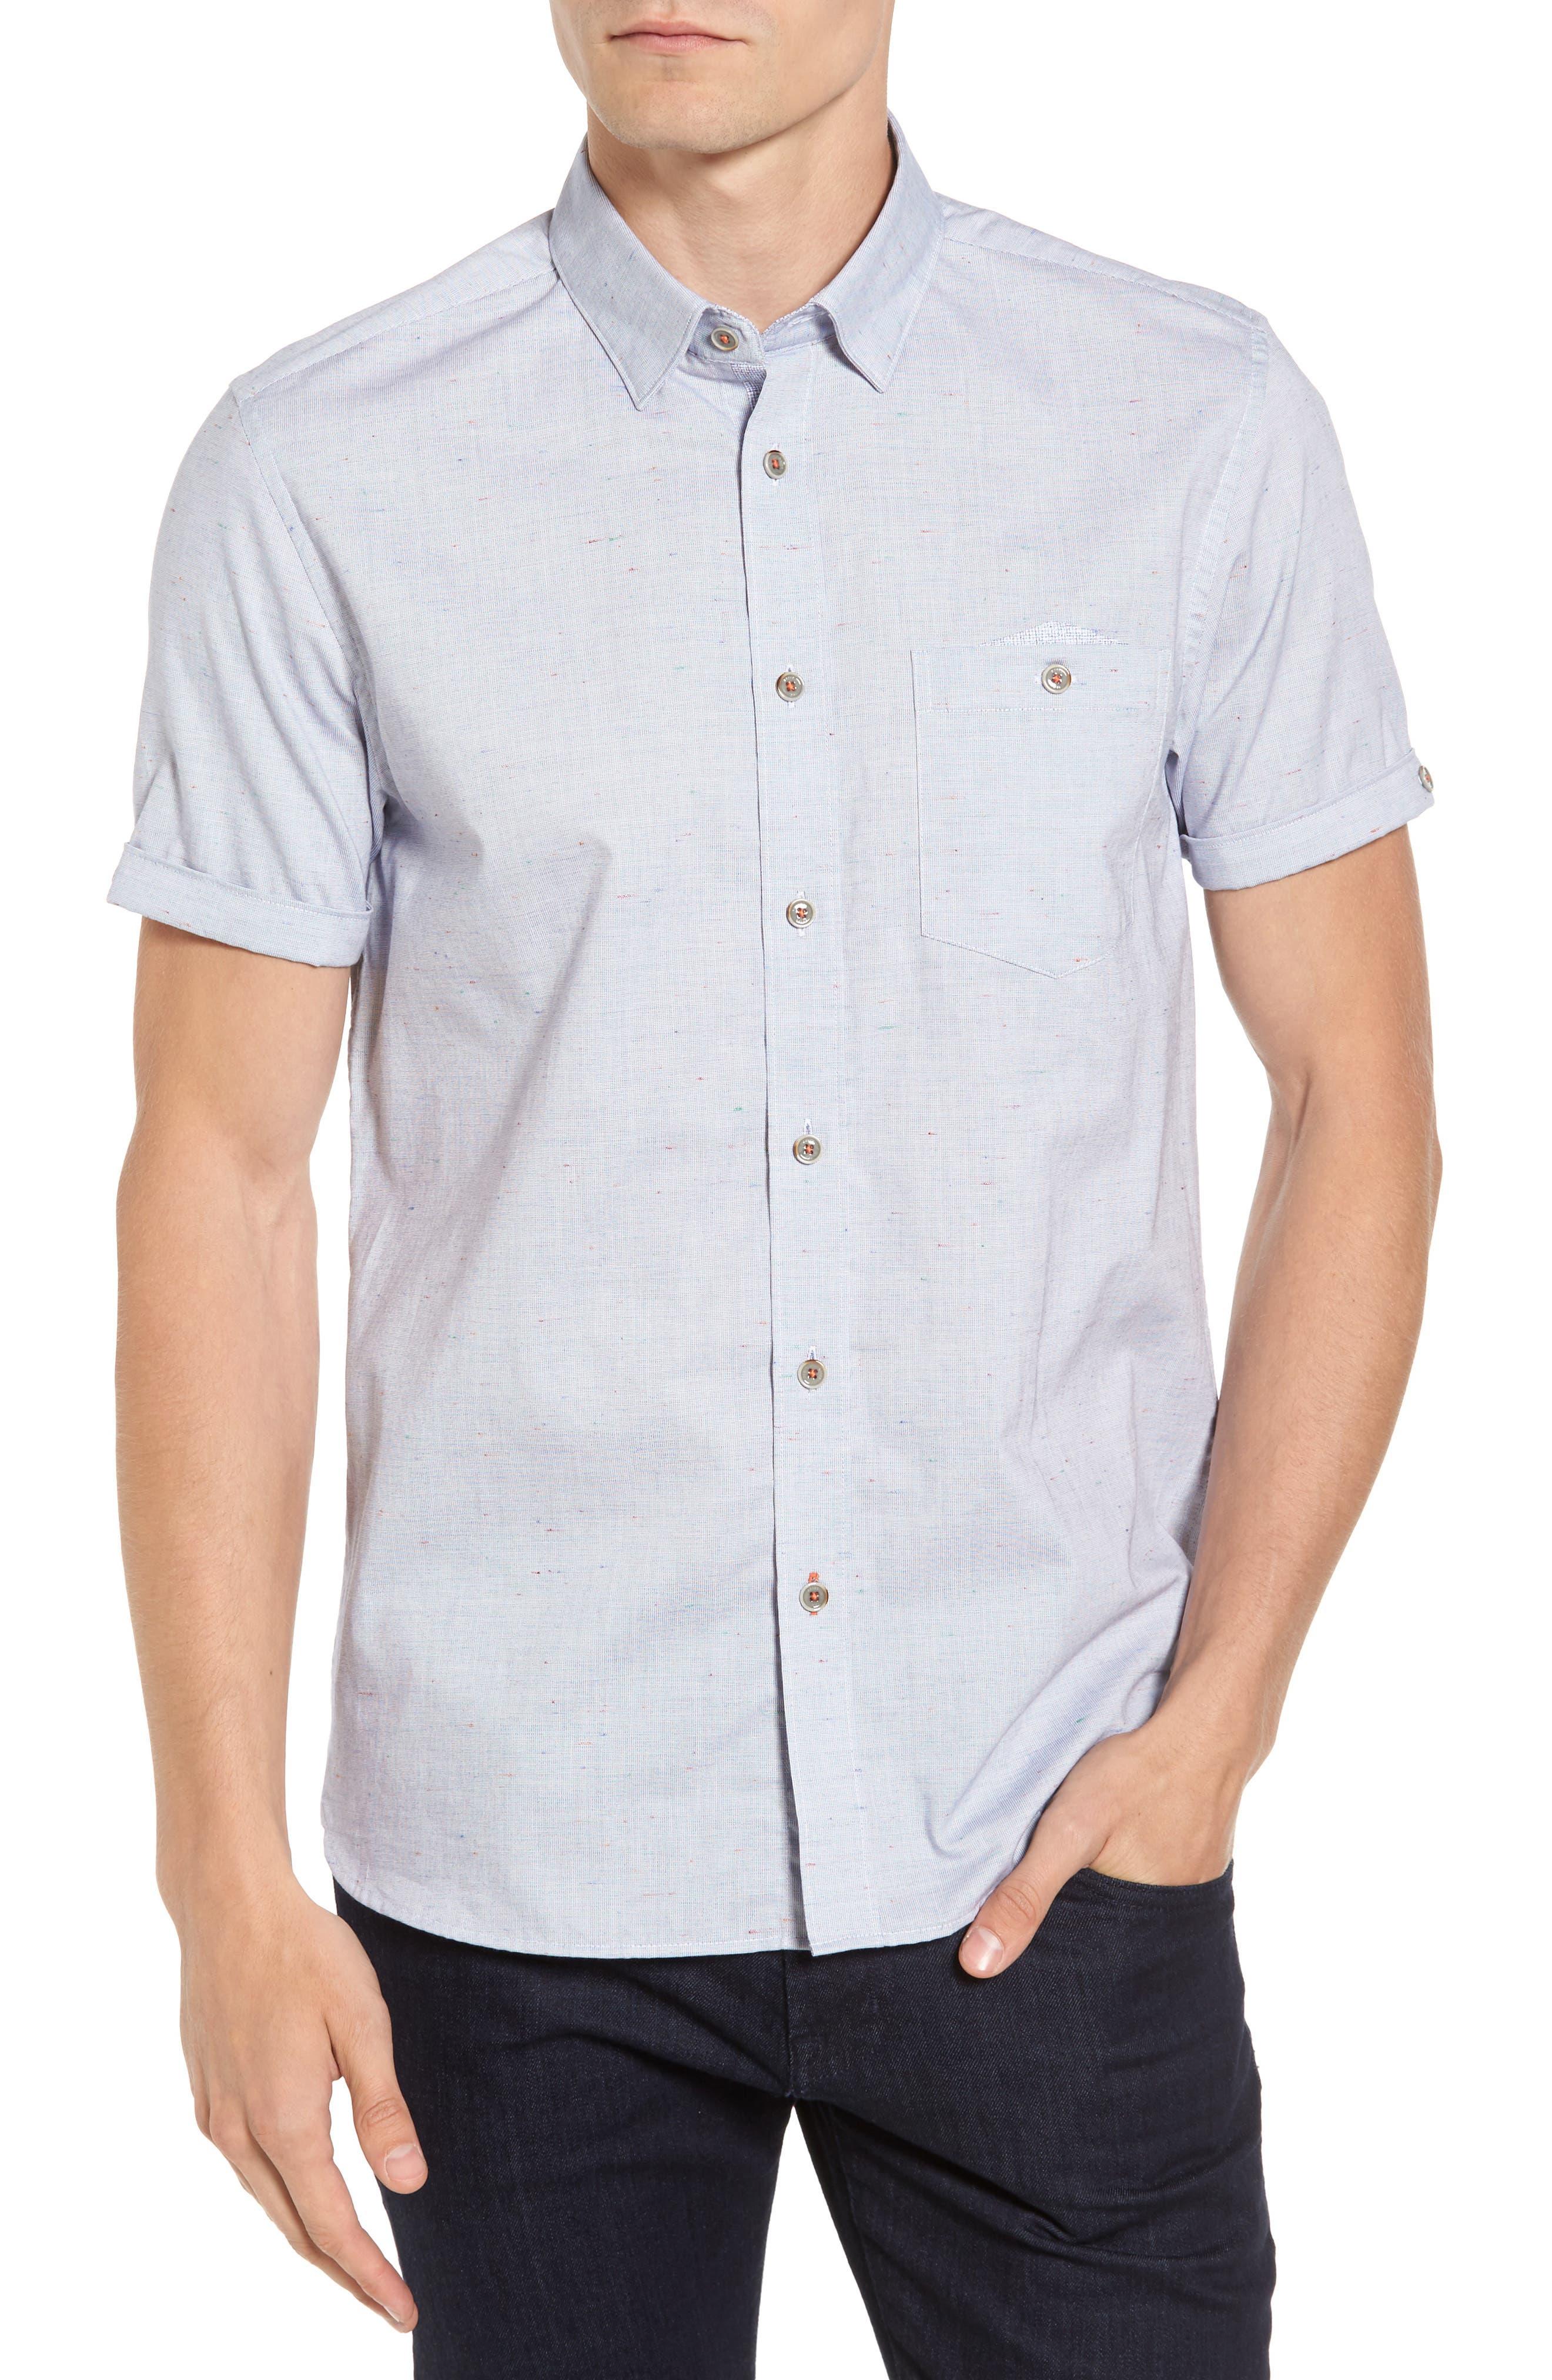 Main Image - Ted Baker London Beya Slim Fit Nepped Woven Shirt